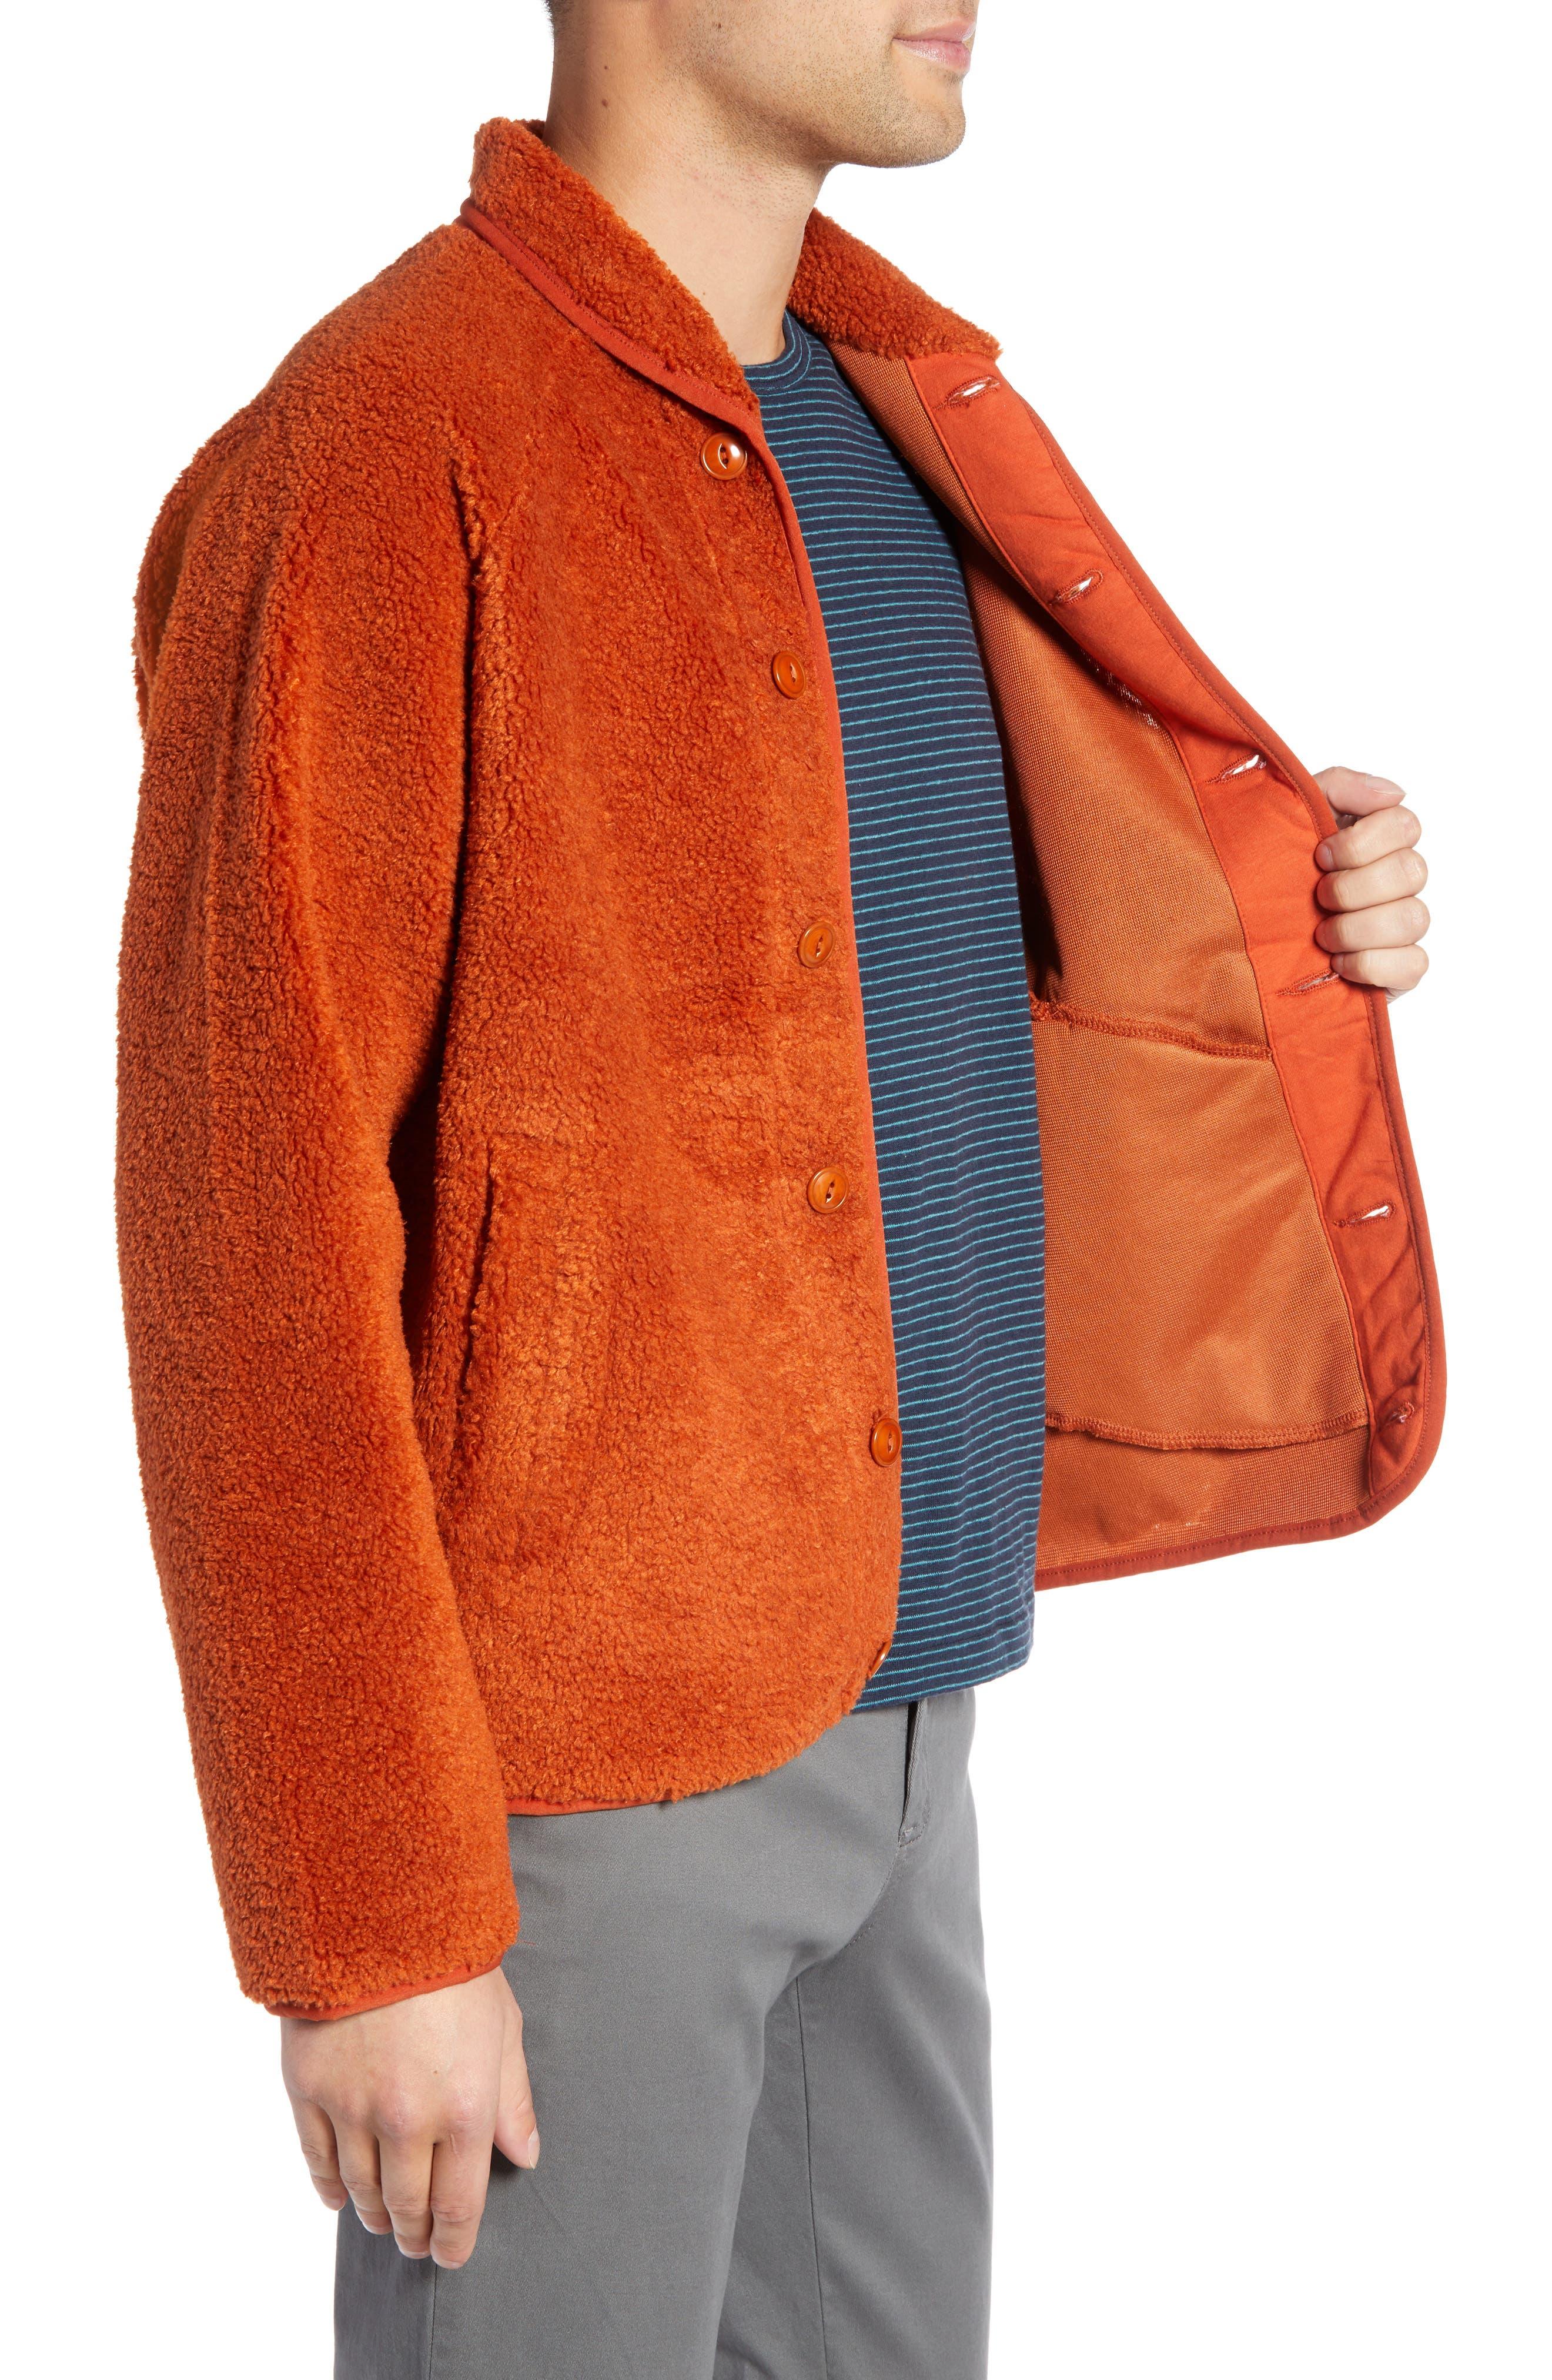 Beach Fleece Jacket,                             Alternate thumbnail 3, color,                             600